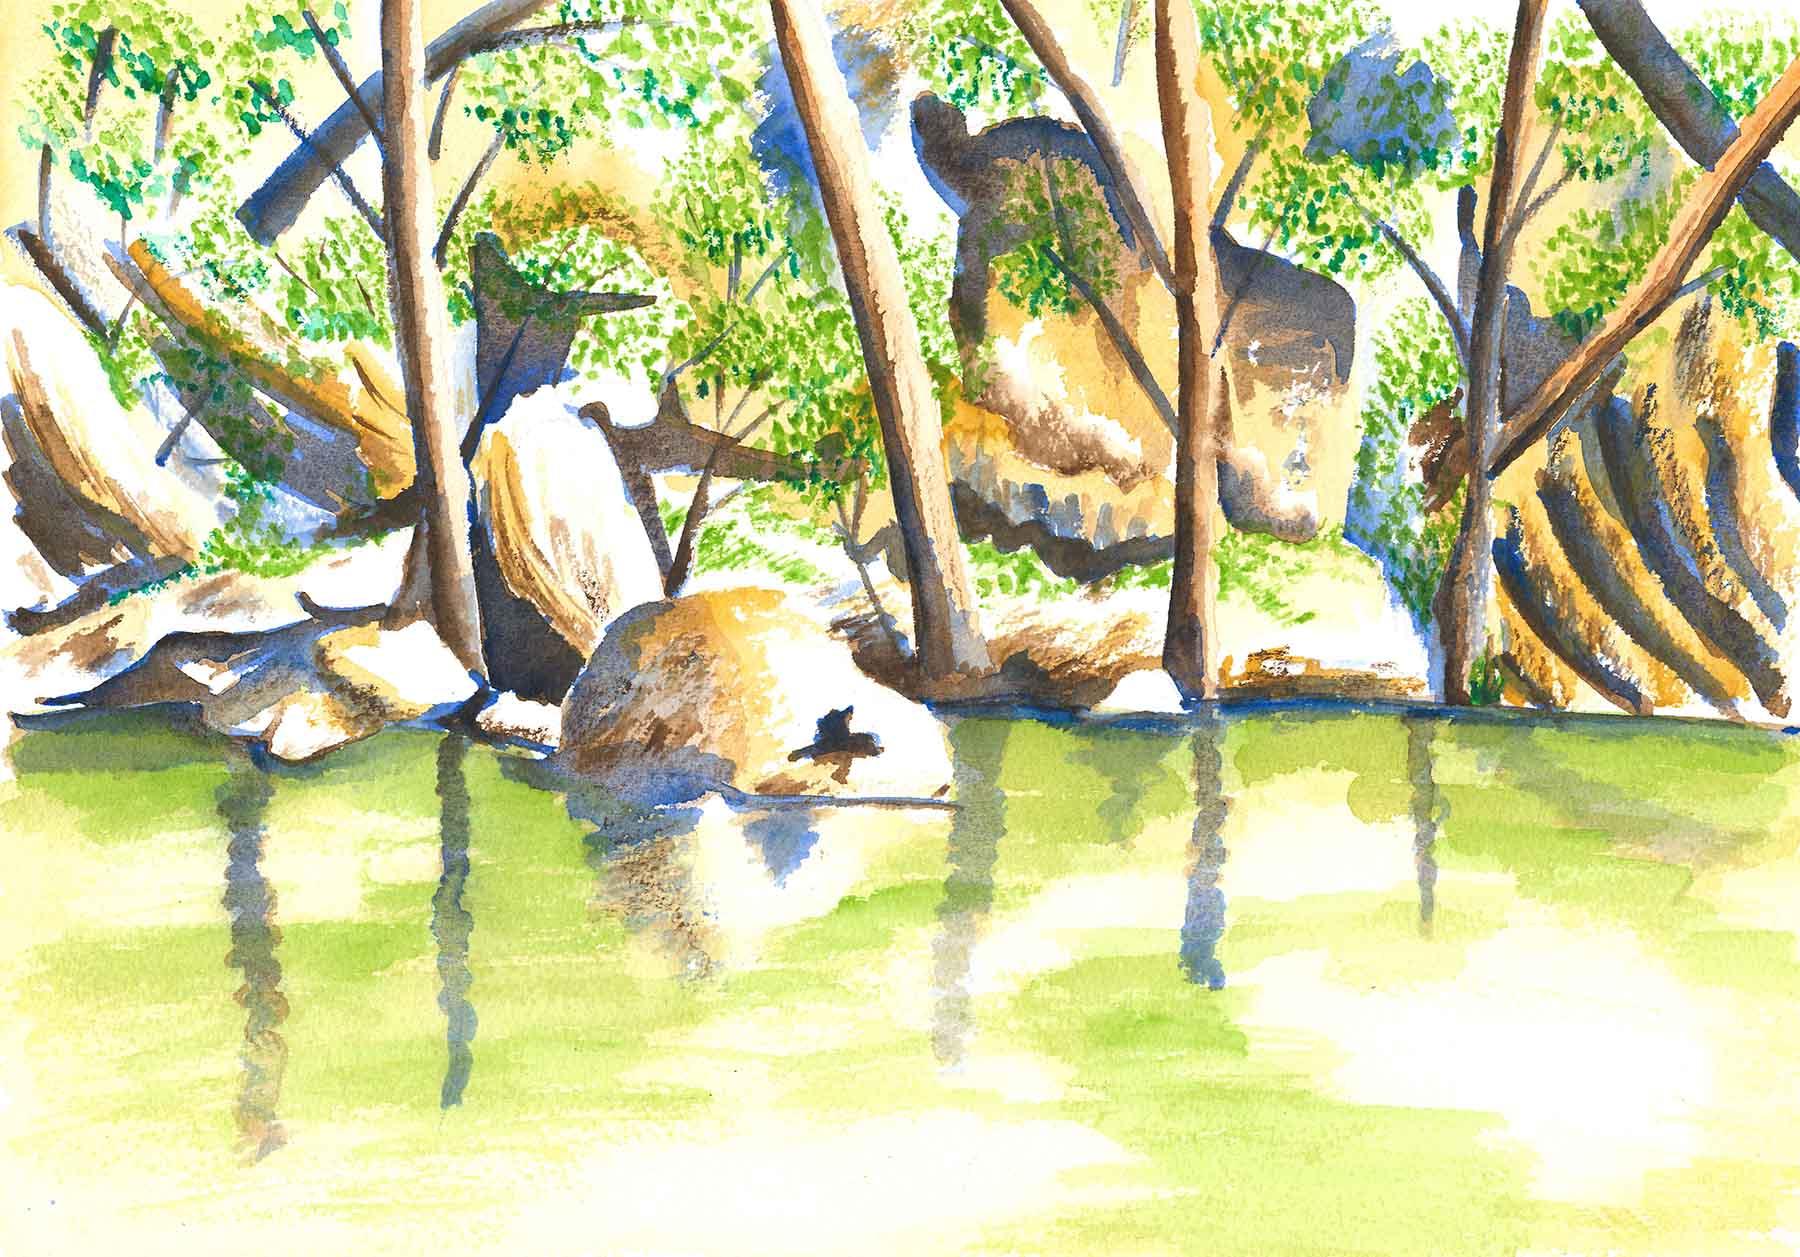 Turon River Sofala